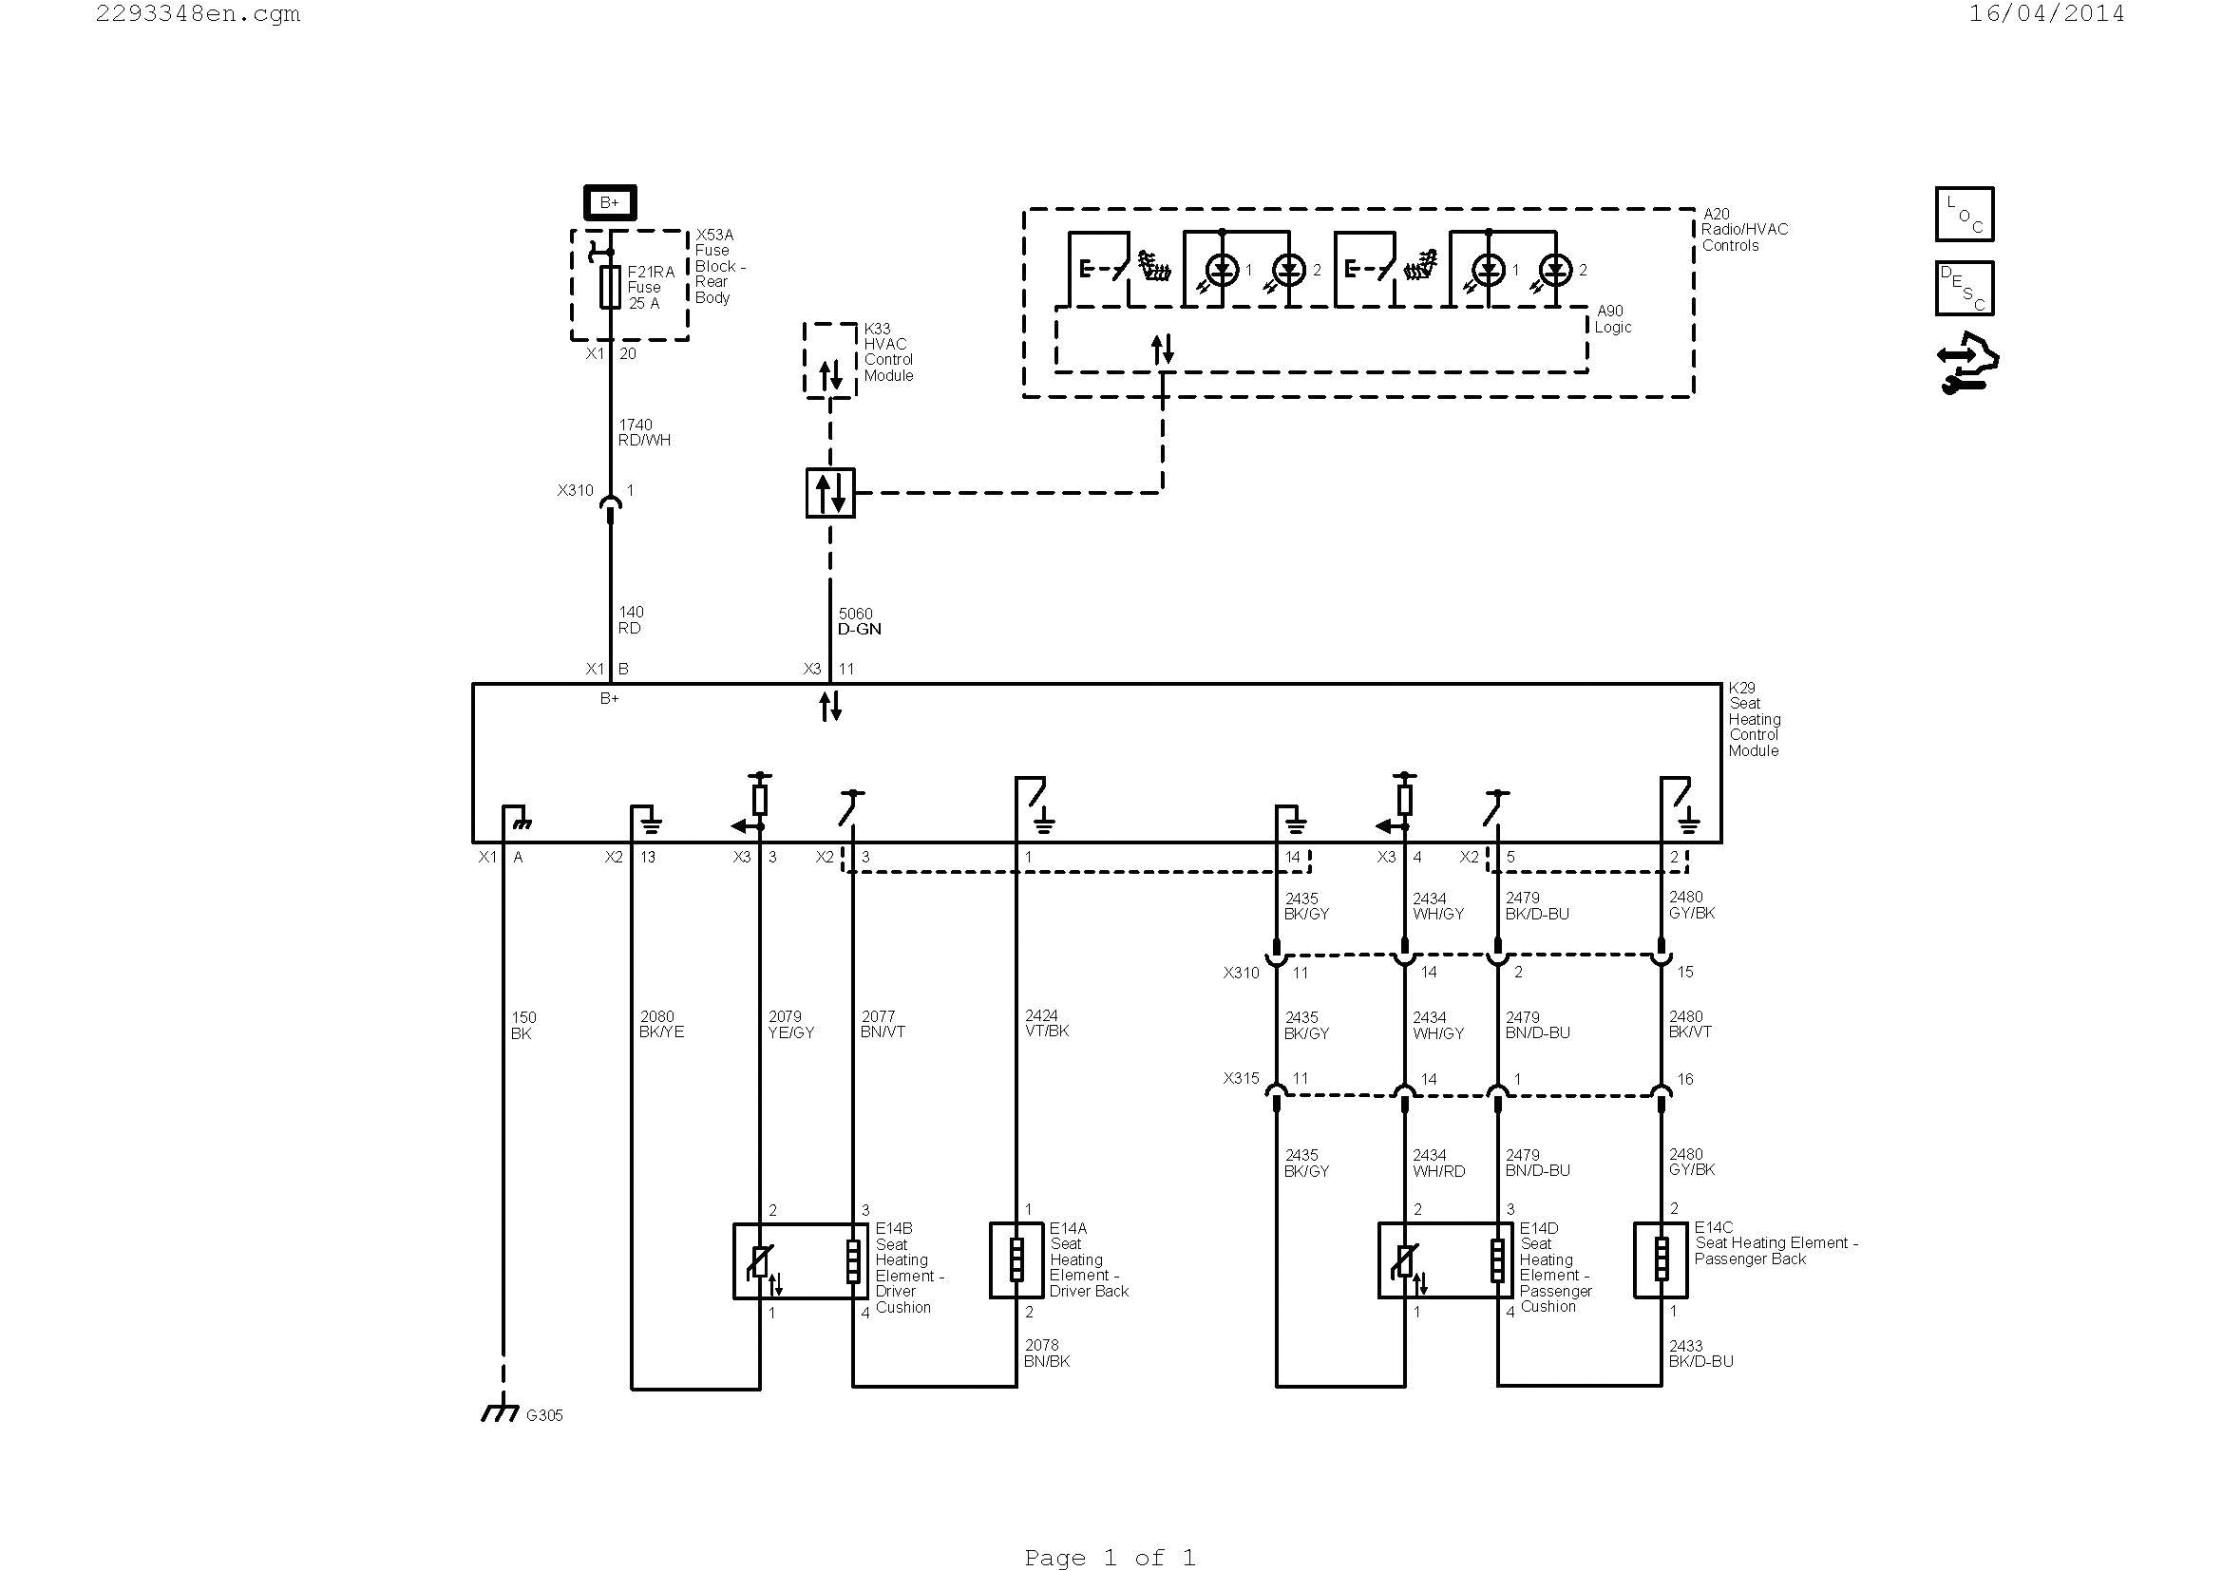 wiring diagram symbols wiring diagram guitar fresh hvac diagram best hvac diagram 0d